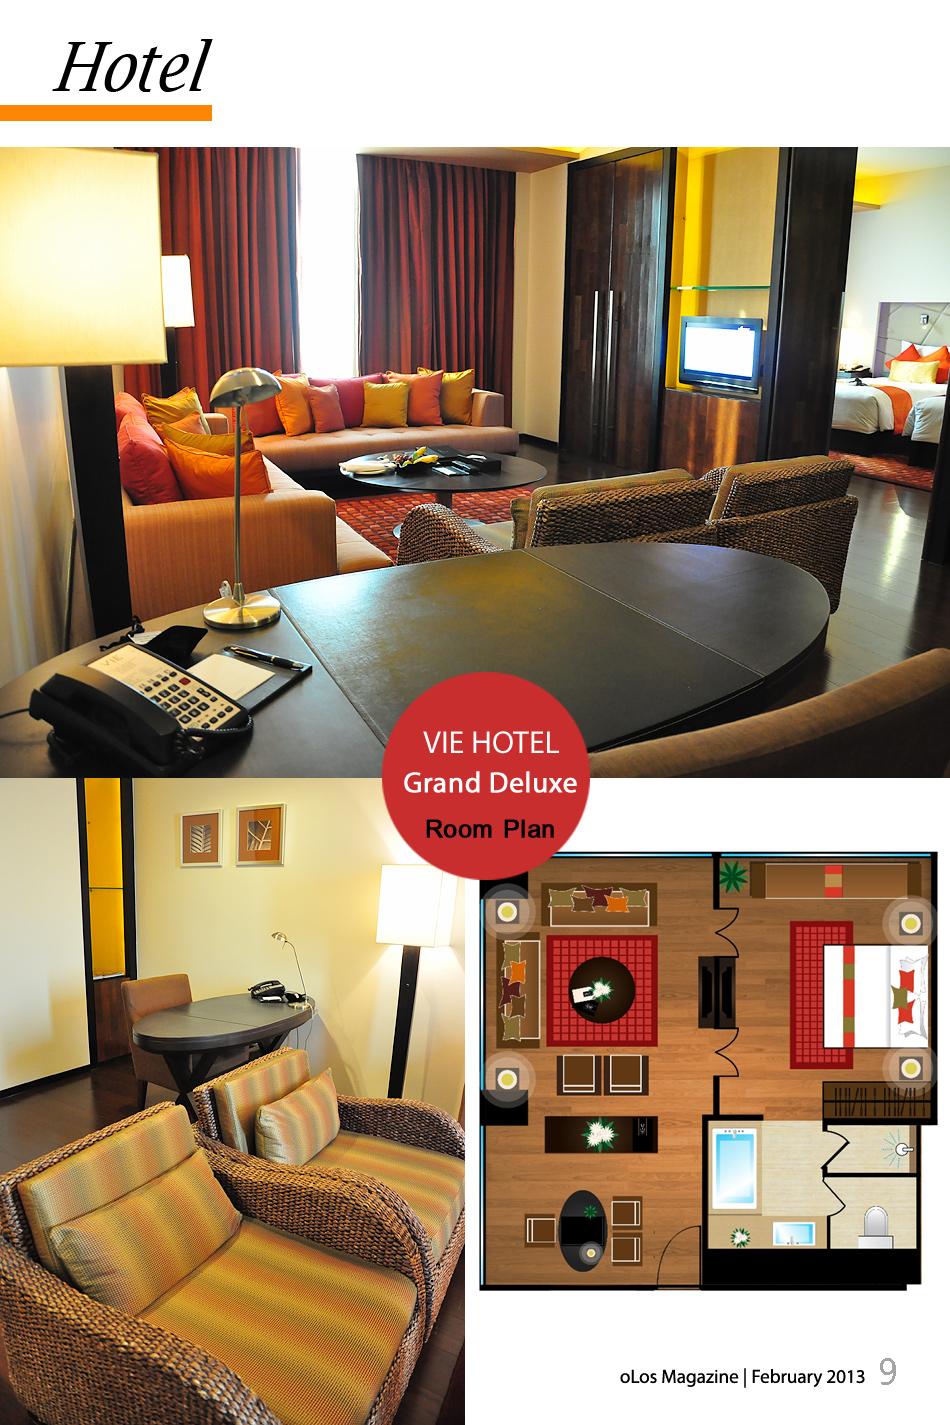 The Designed Life @ VIE HOTEL, Bangkok โรงแรมวี กรุงเทพ ถนนพญาไท ที่พัก โรงแรม รีสอรท์ บาร์ อาหารเอเชี่ยนและนานาชาติ ไวน์ สปา